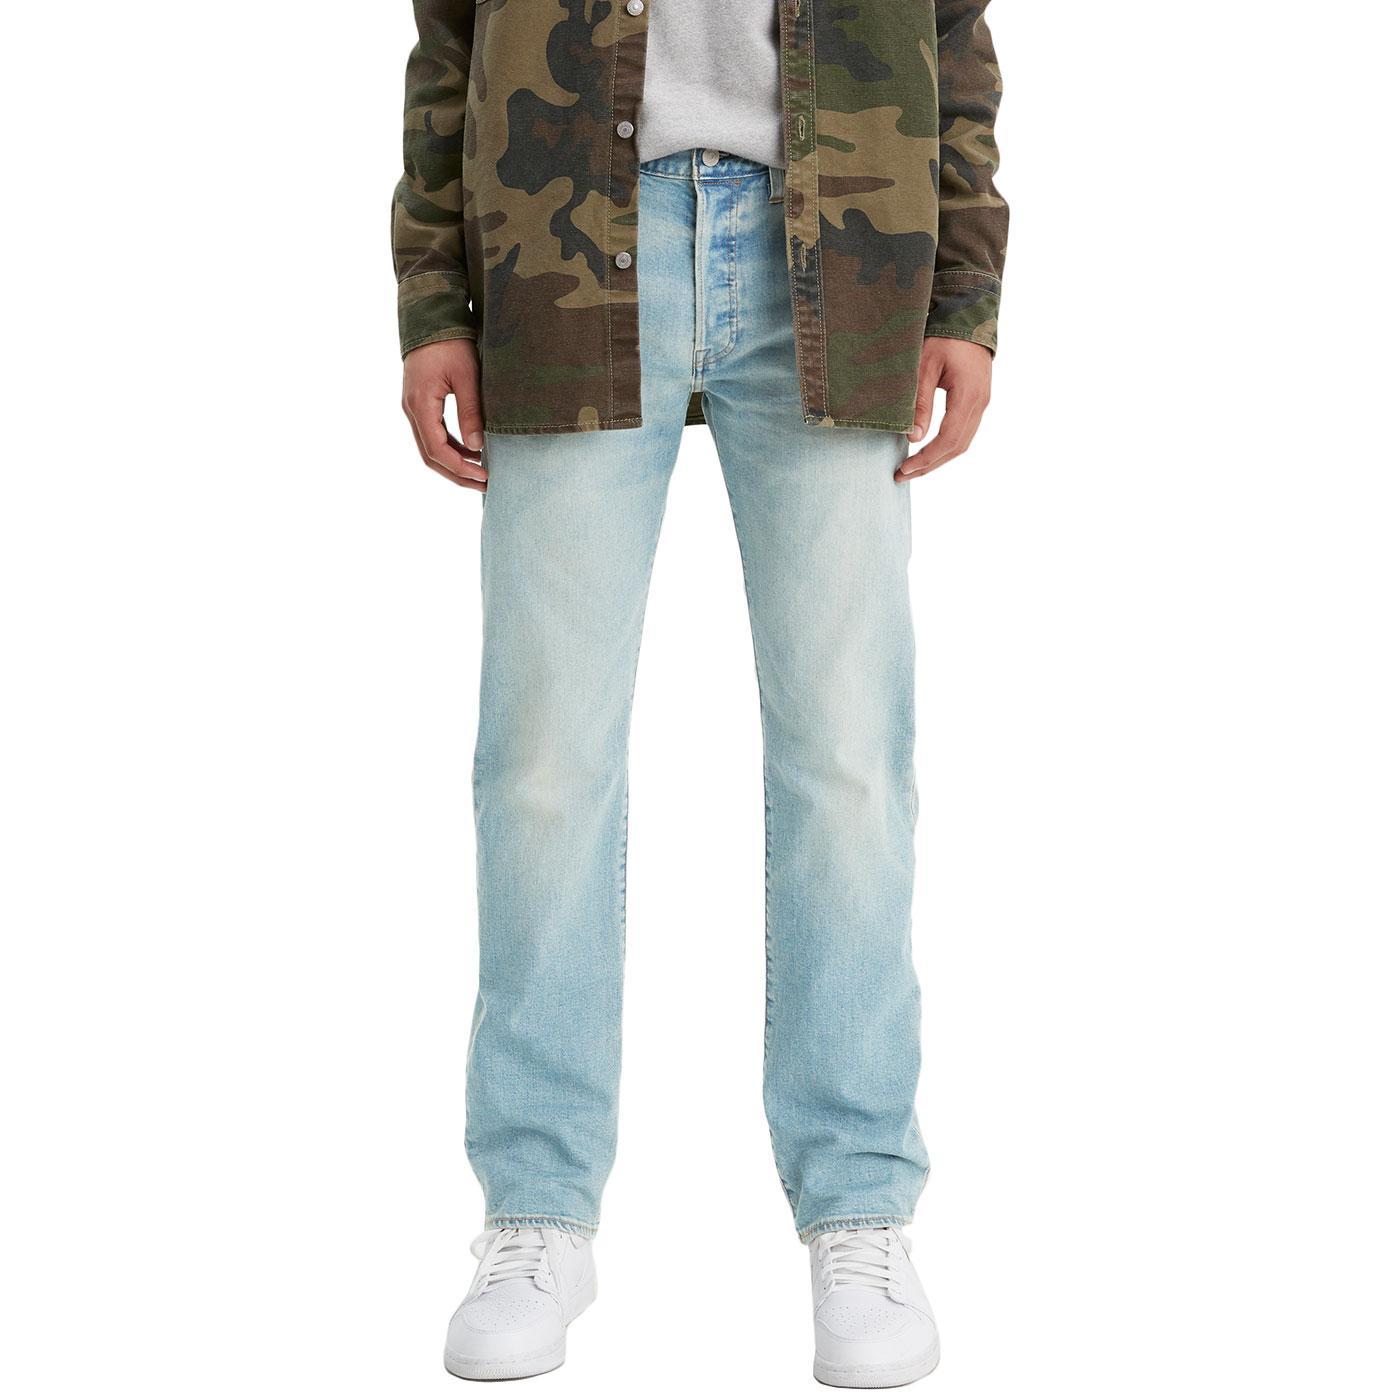 LEVI'S 501 Original Straight Jeans CONEFLOWER TINT